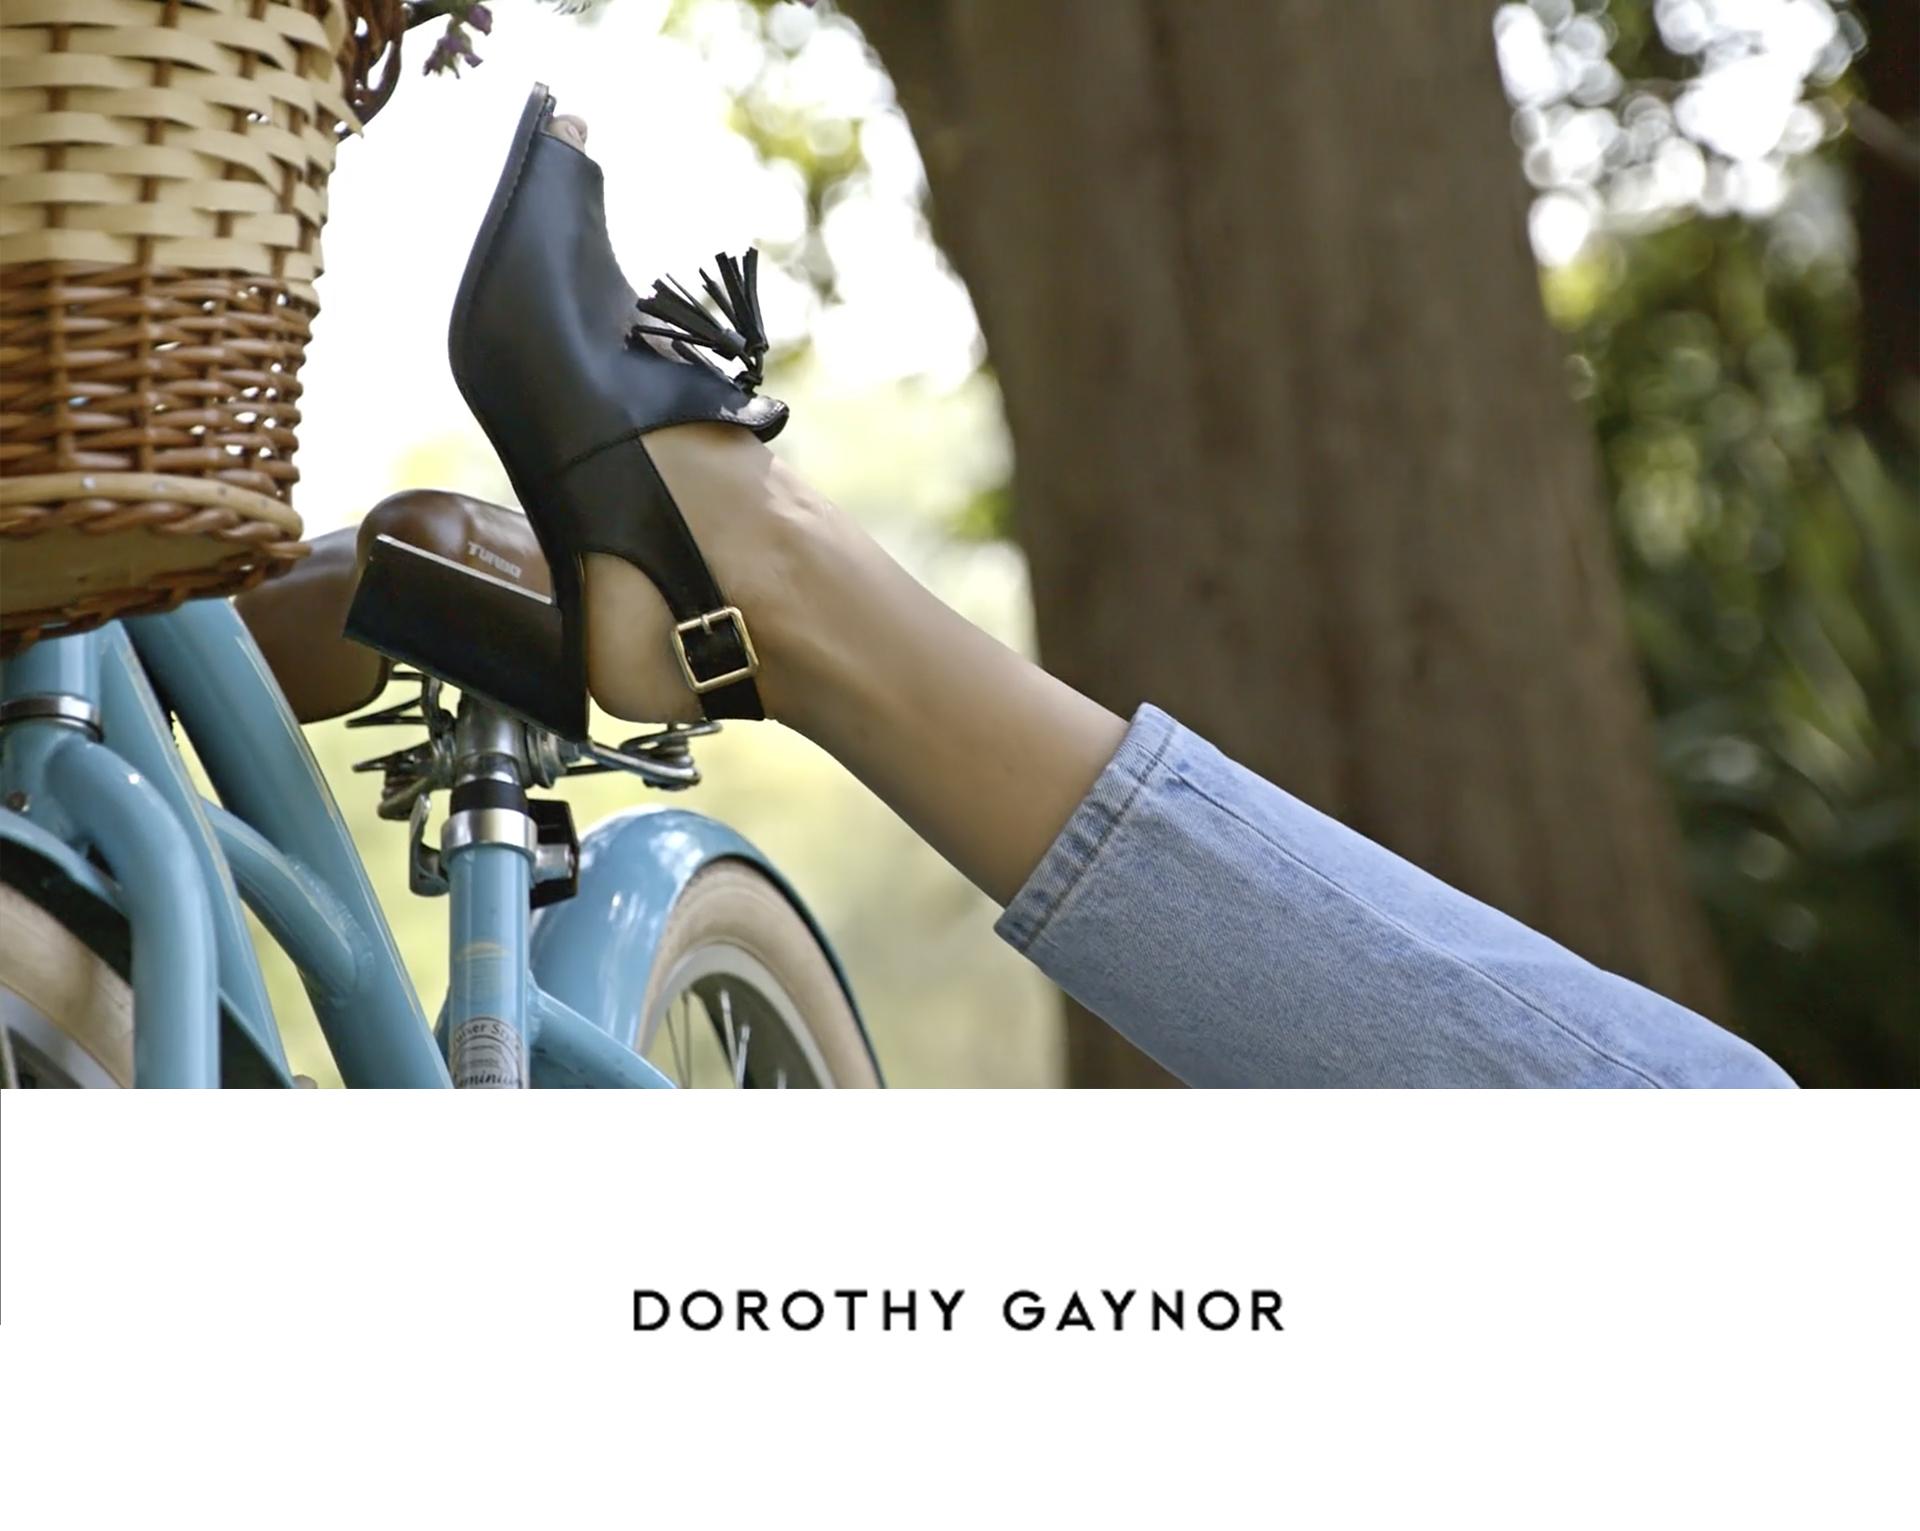 DorothyGaynor.jpg